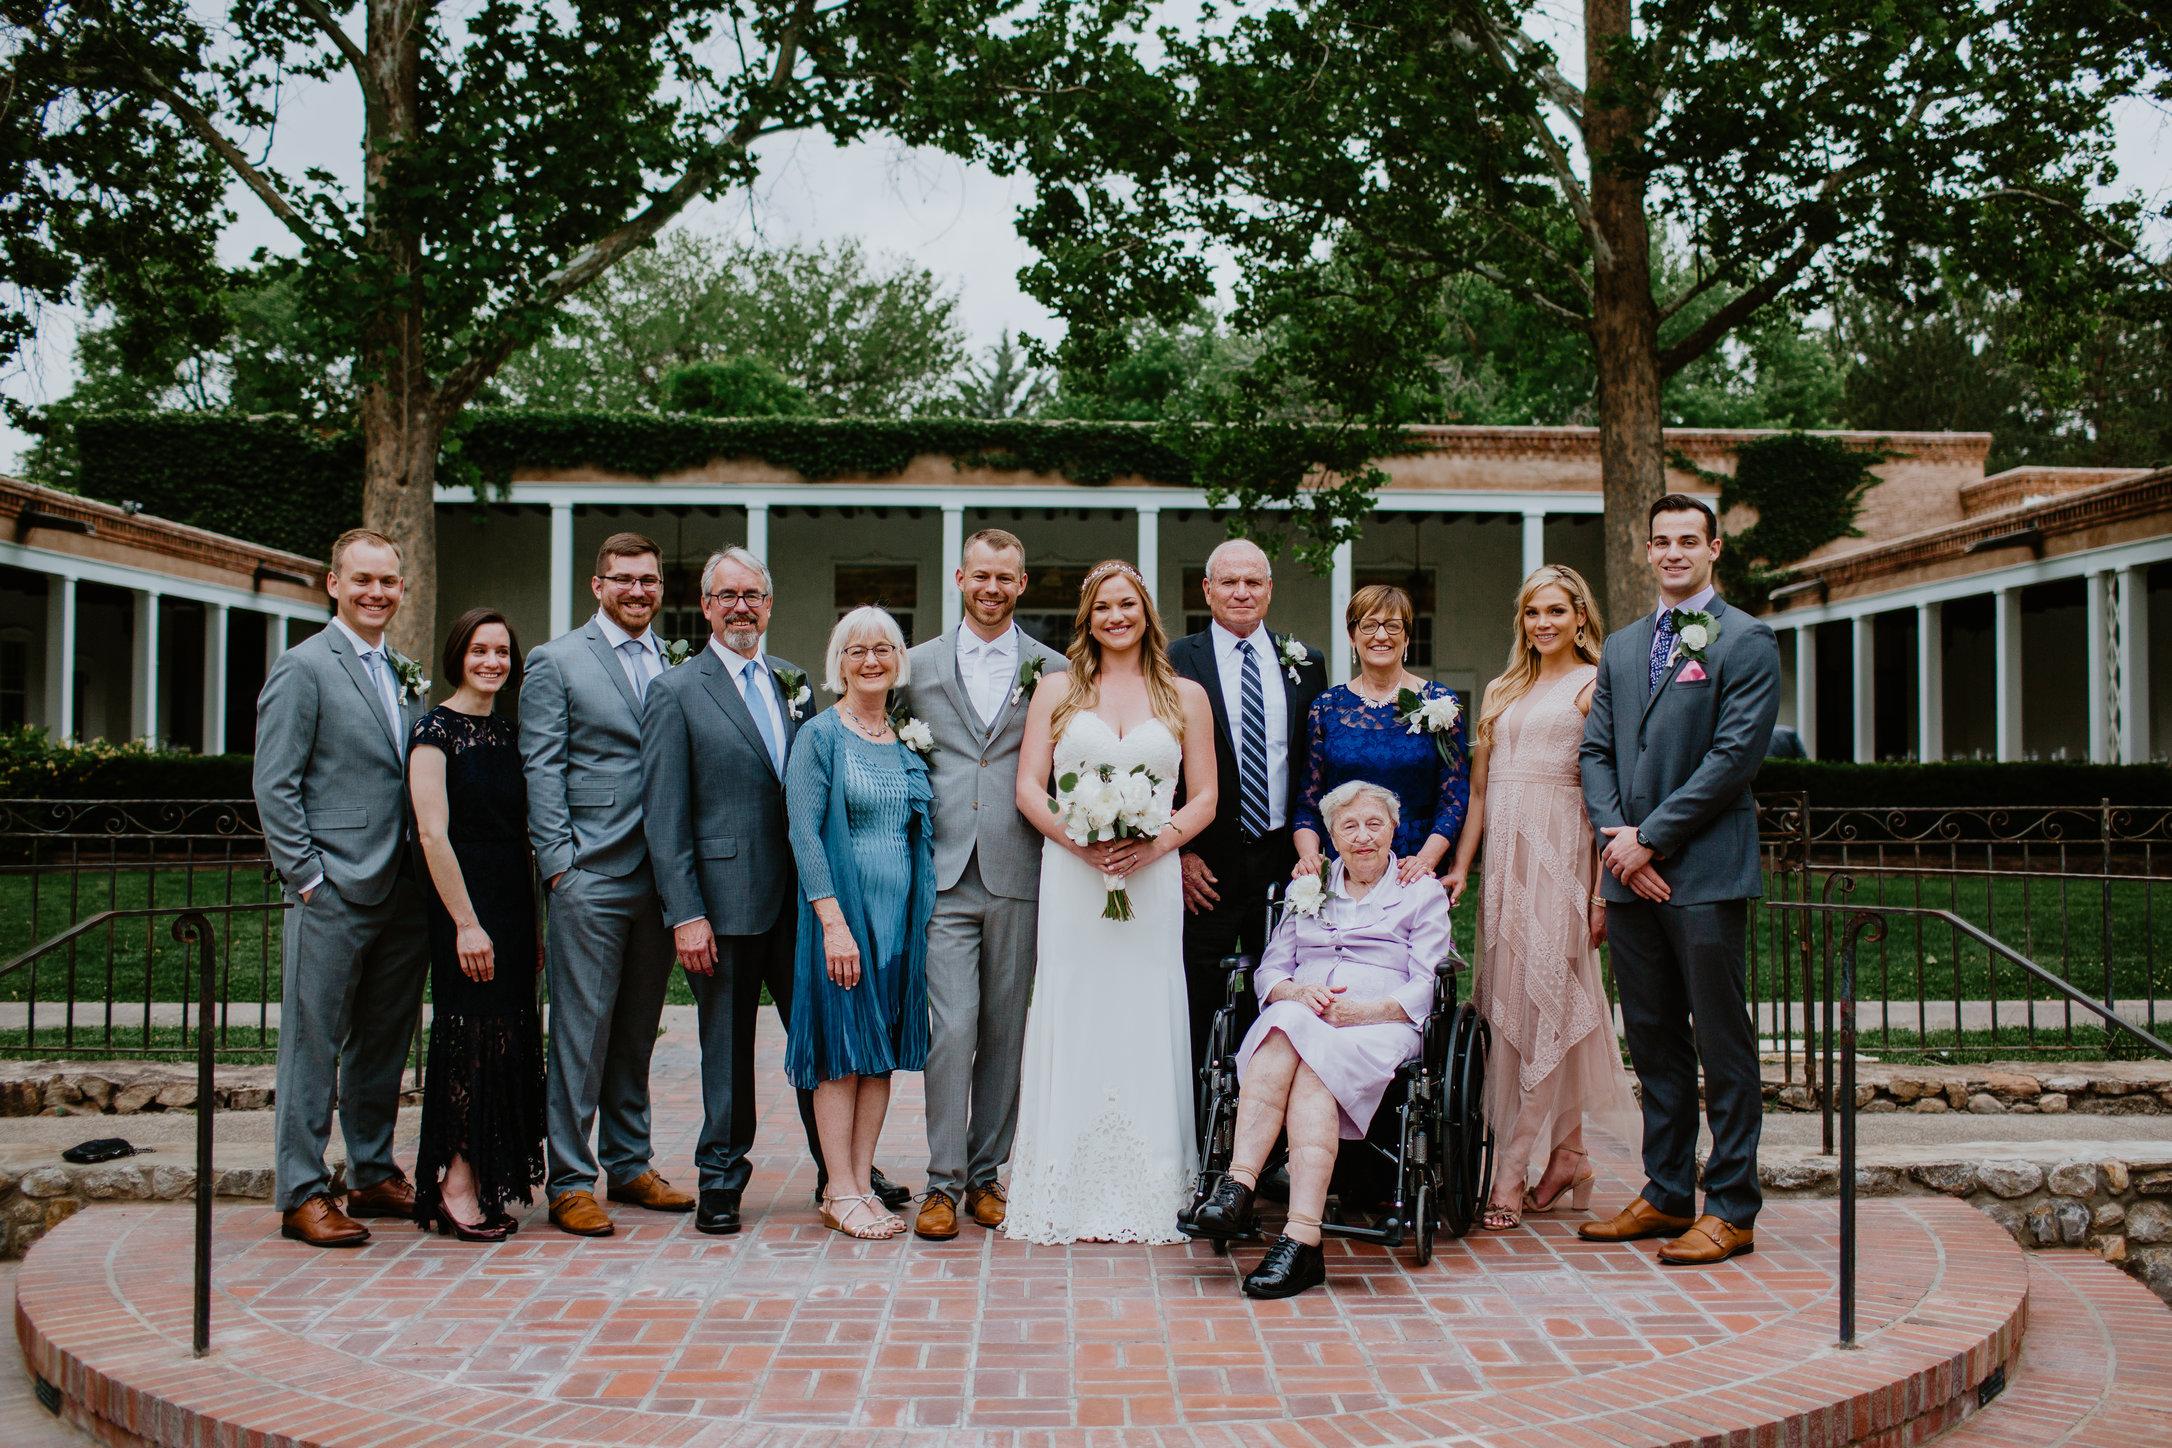 DandA-wedding-470.jpg